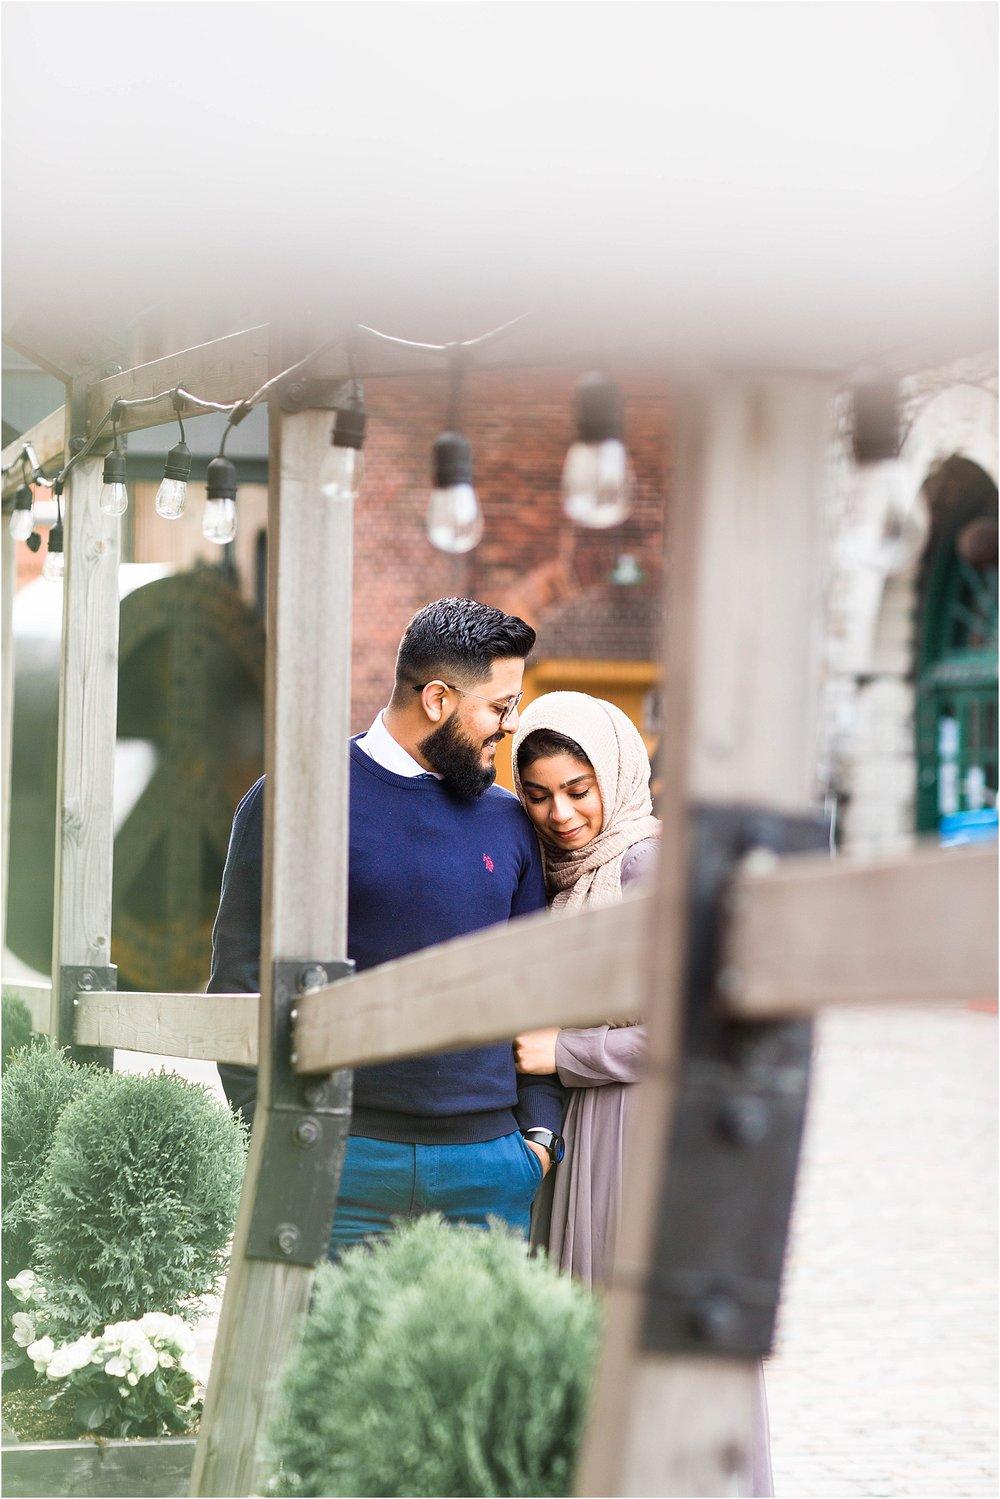 Polson-Pier-Distillery-District-Engagement-Session-Toronto-Mississauga-Brampton-Scarborough-GTA-Pakistani-Indian-Wedding-Engagement-Photographer-Photography_0031.jpg